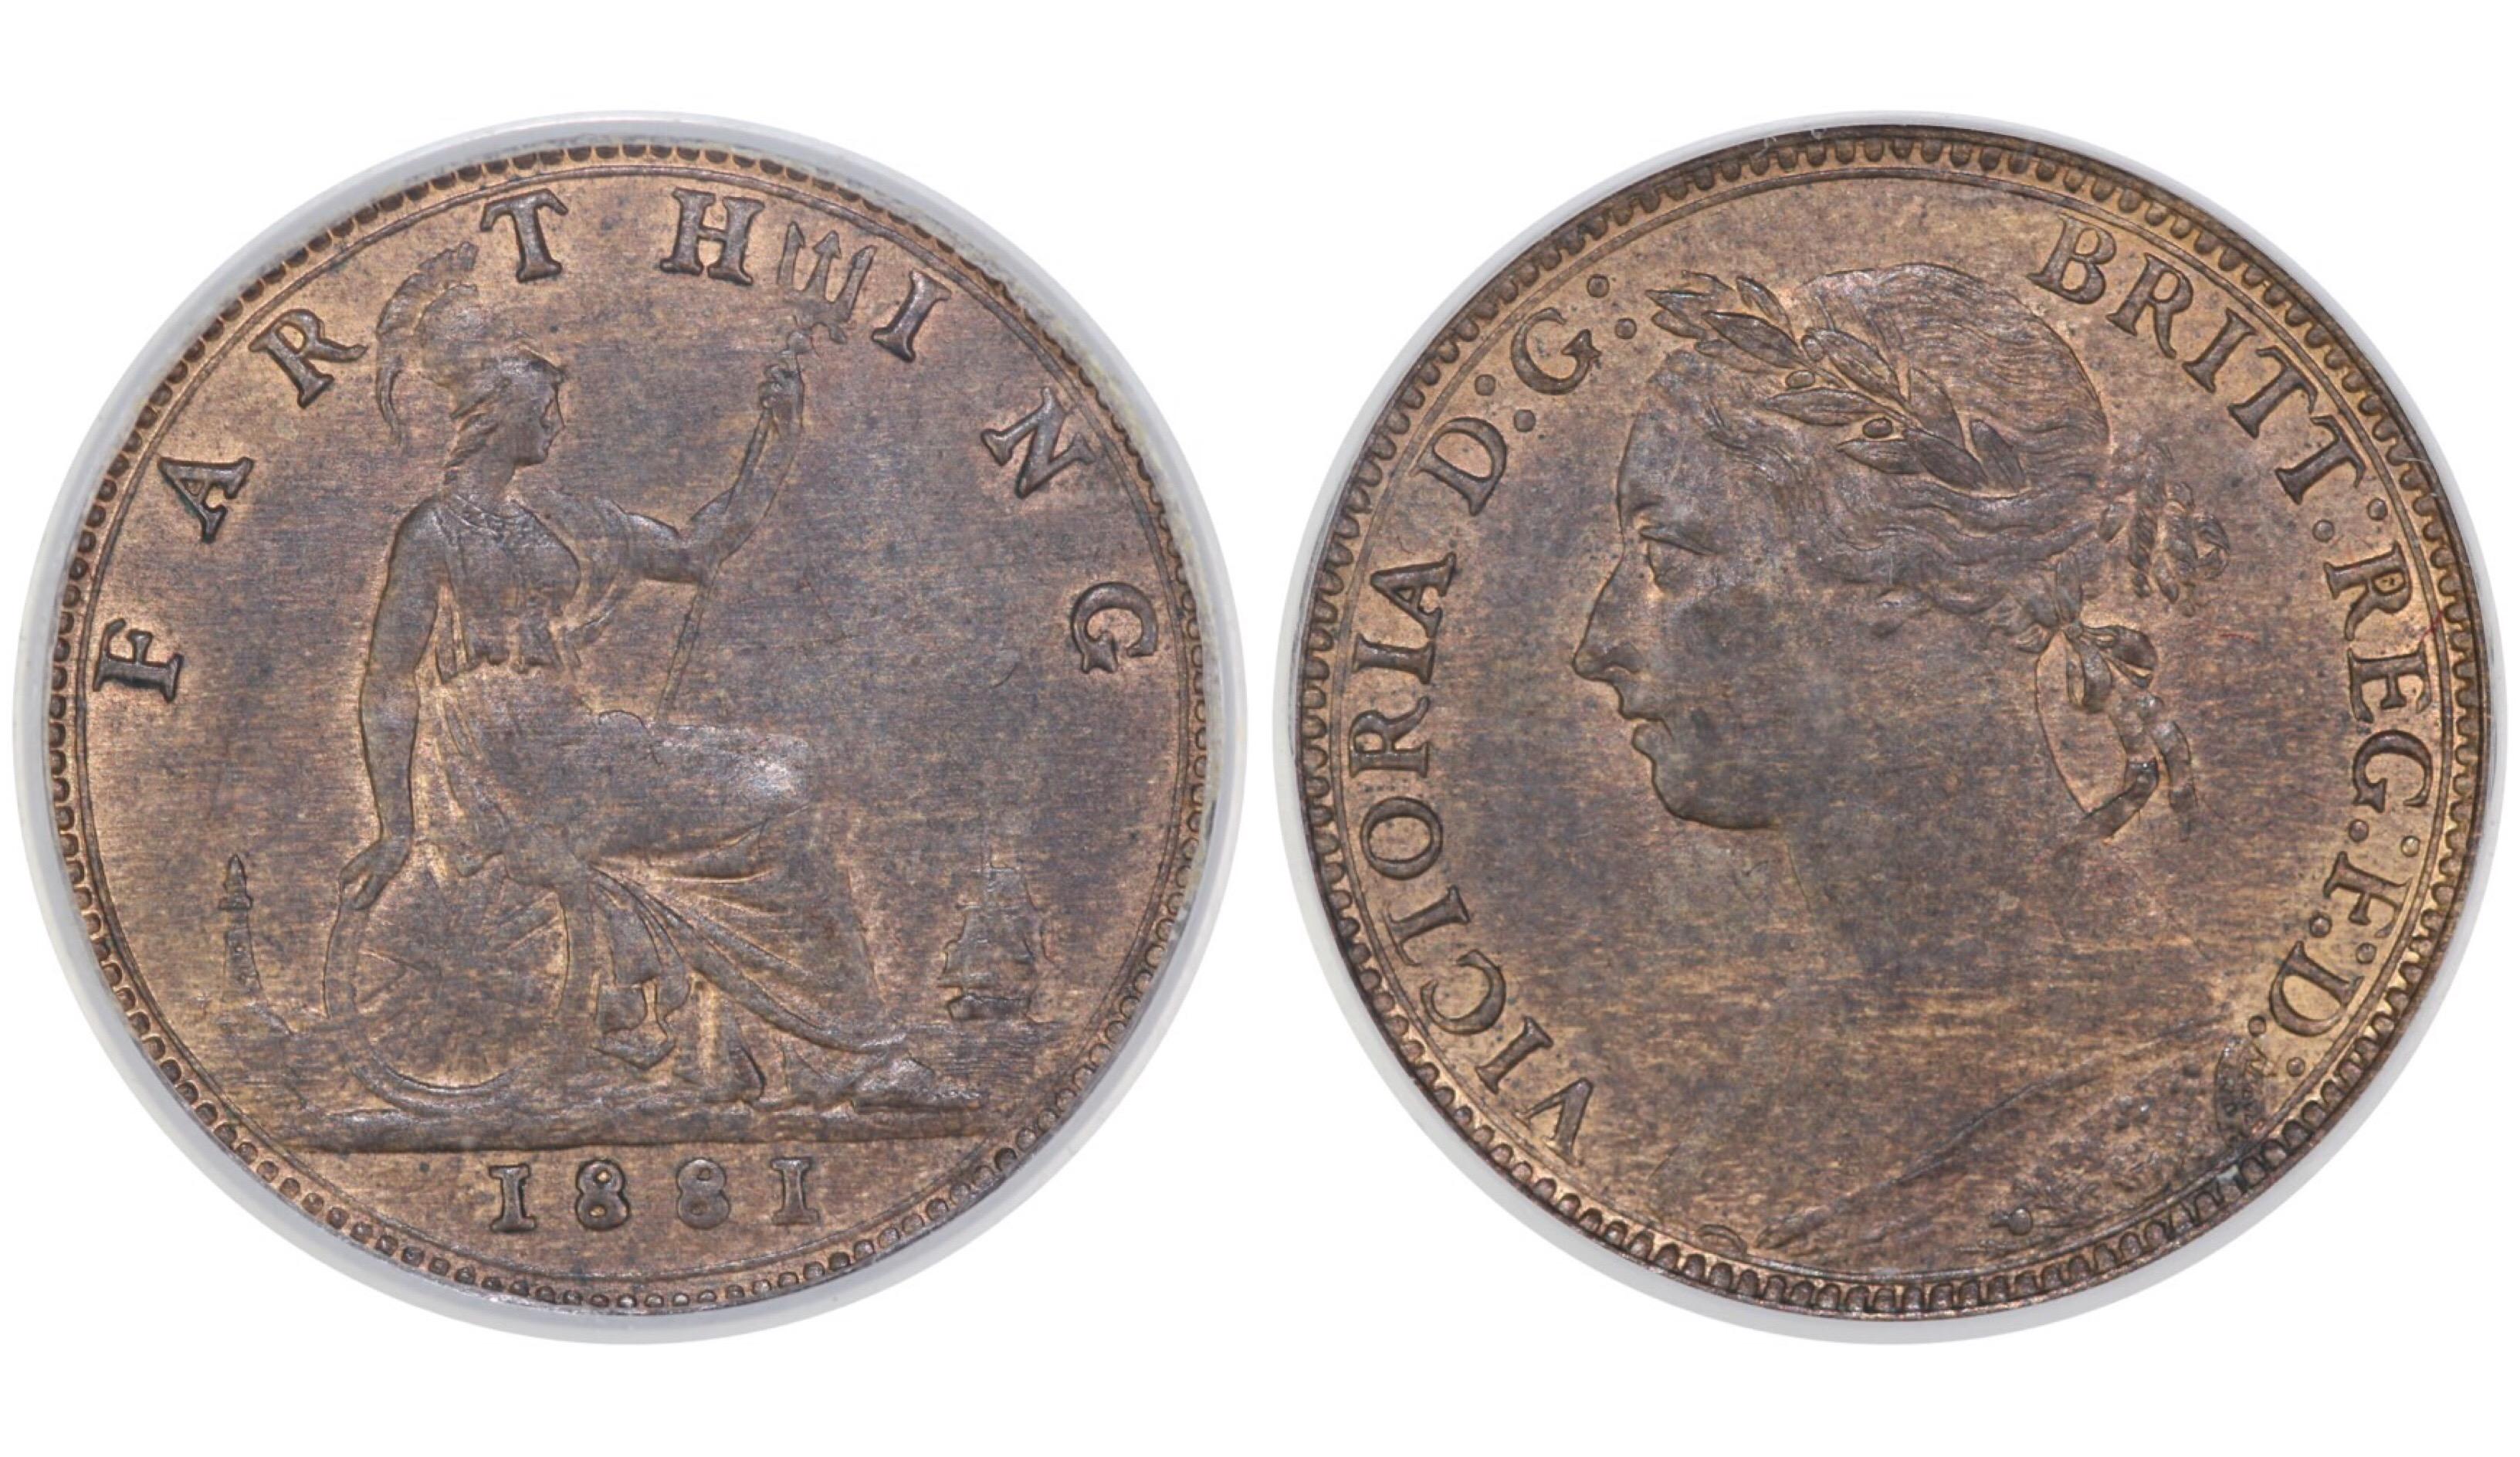 1881 Farthing, CGS 70, Victoria, Freeman 546, UIN 22668